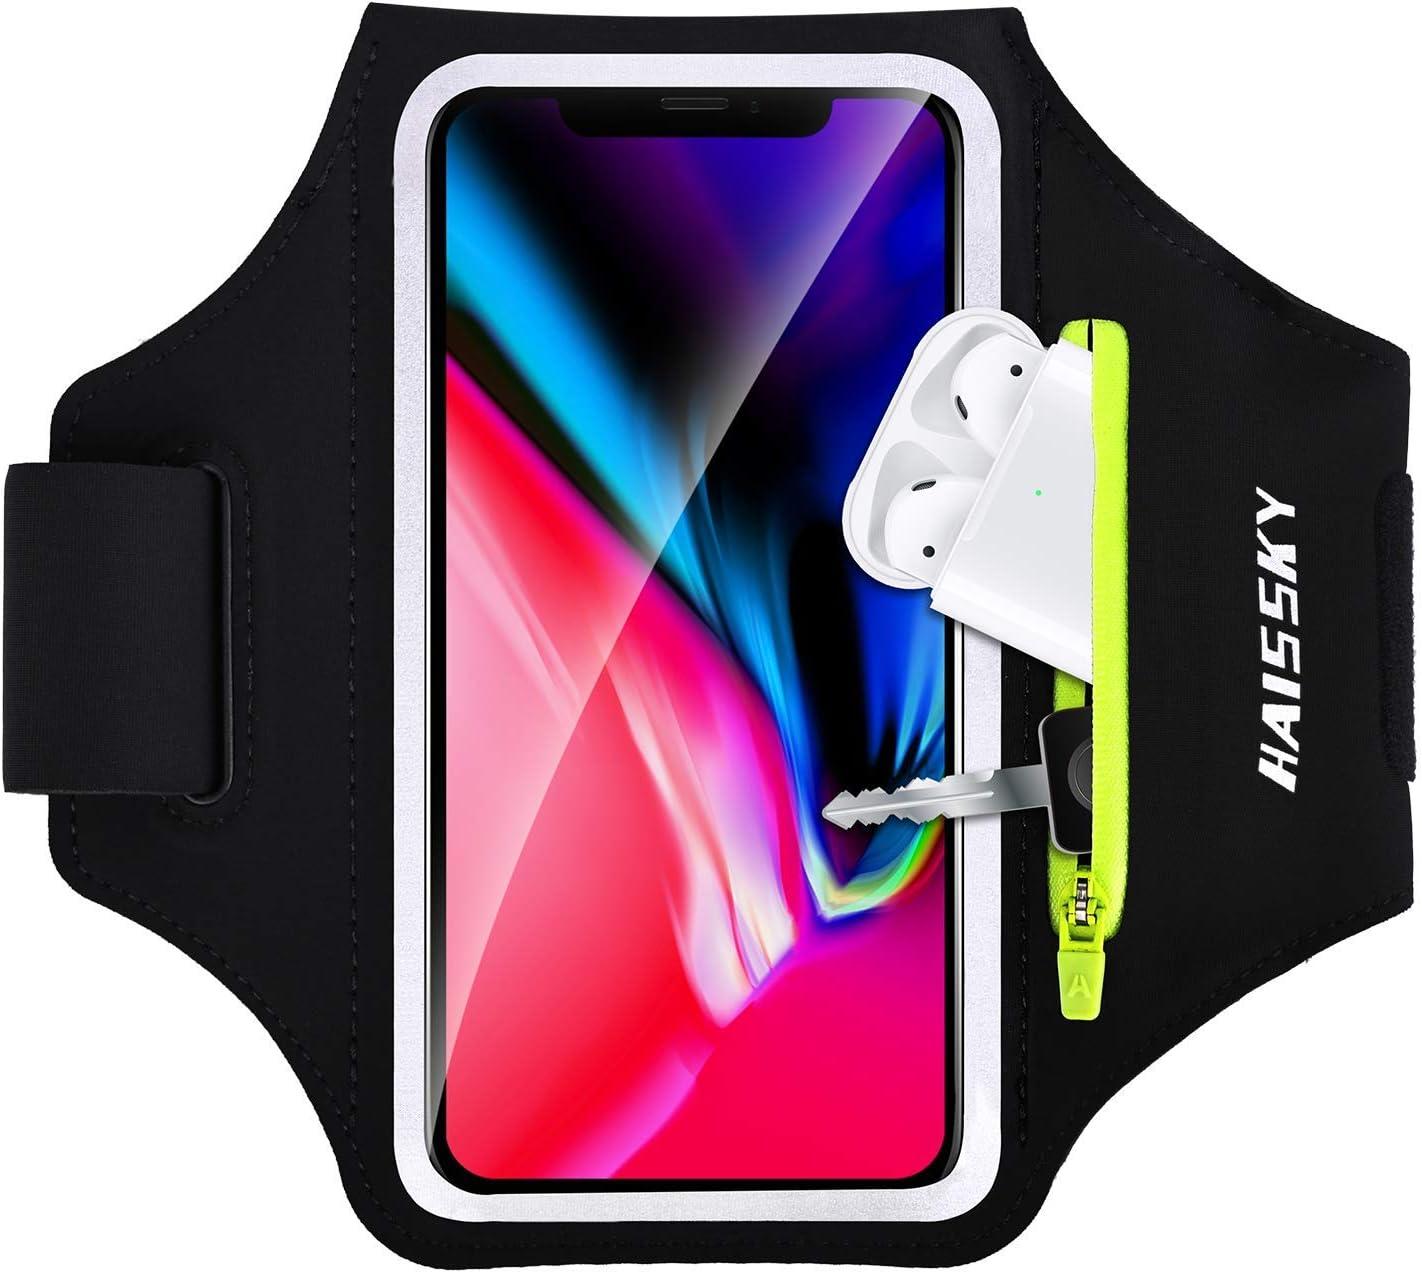 Brazalete Deportivo para Corre con Airpods Holder,HAISSKY Brazalete Móvil Deportivo para iPhone 11 Pro MAX/iPhone 11 Pro/iPhone XS MAX/iPhone XR/ 8 Plus/8 Galaxy S9/S8 Plus,Huawei P20 hasta 6.8